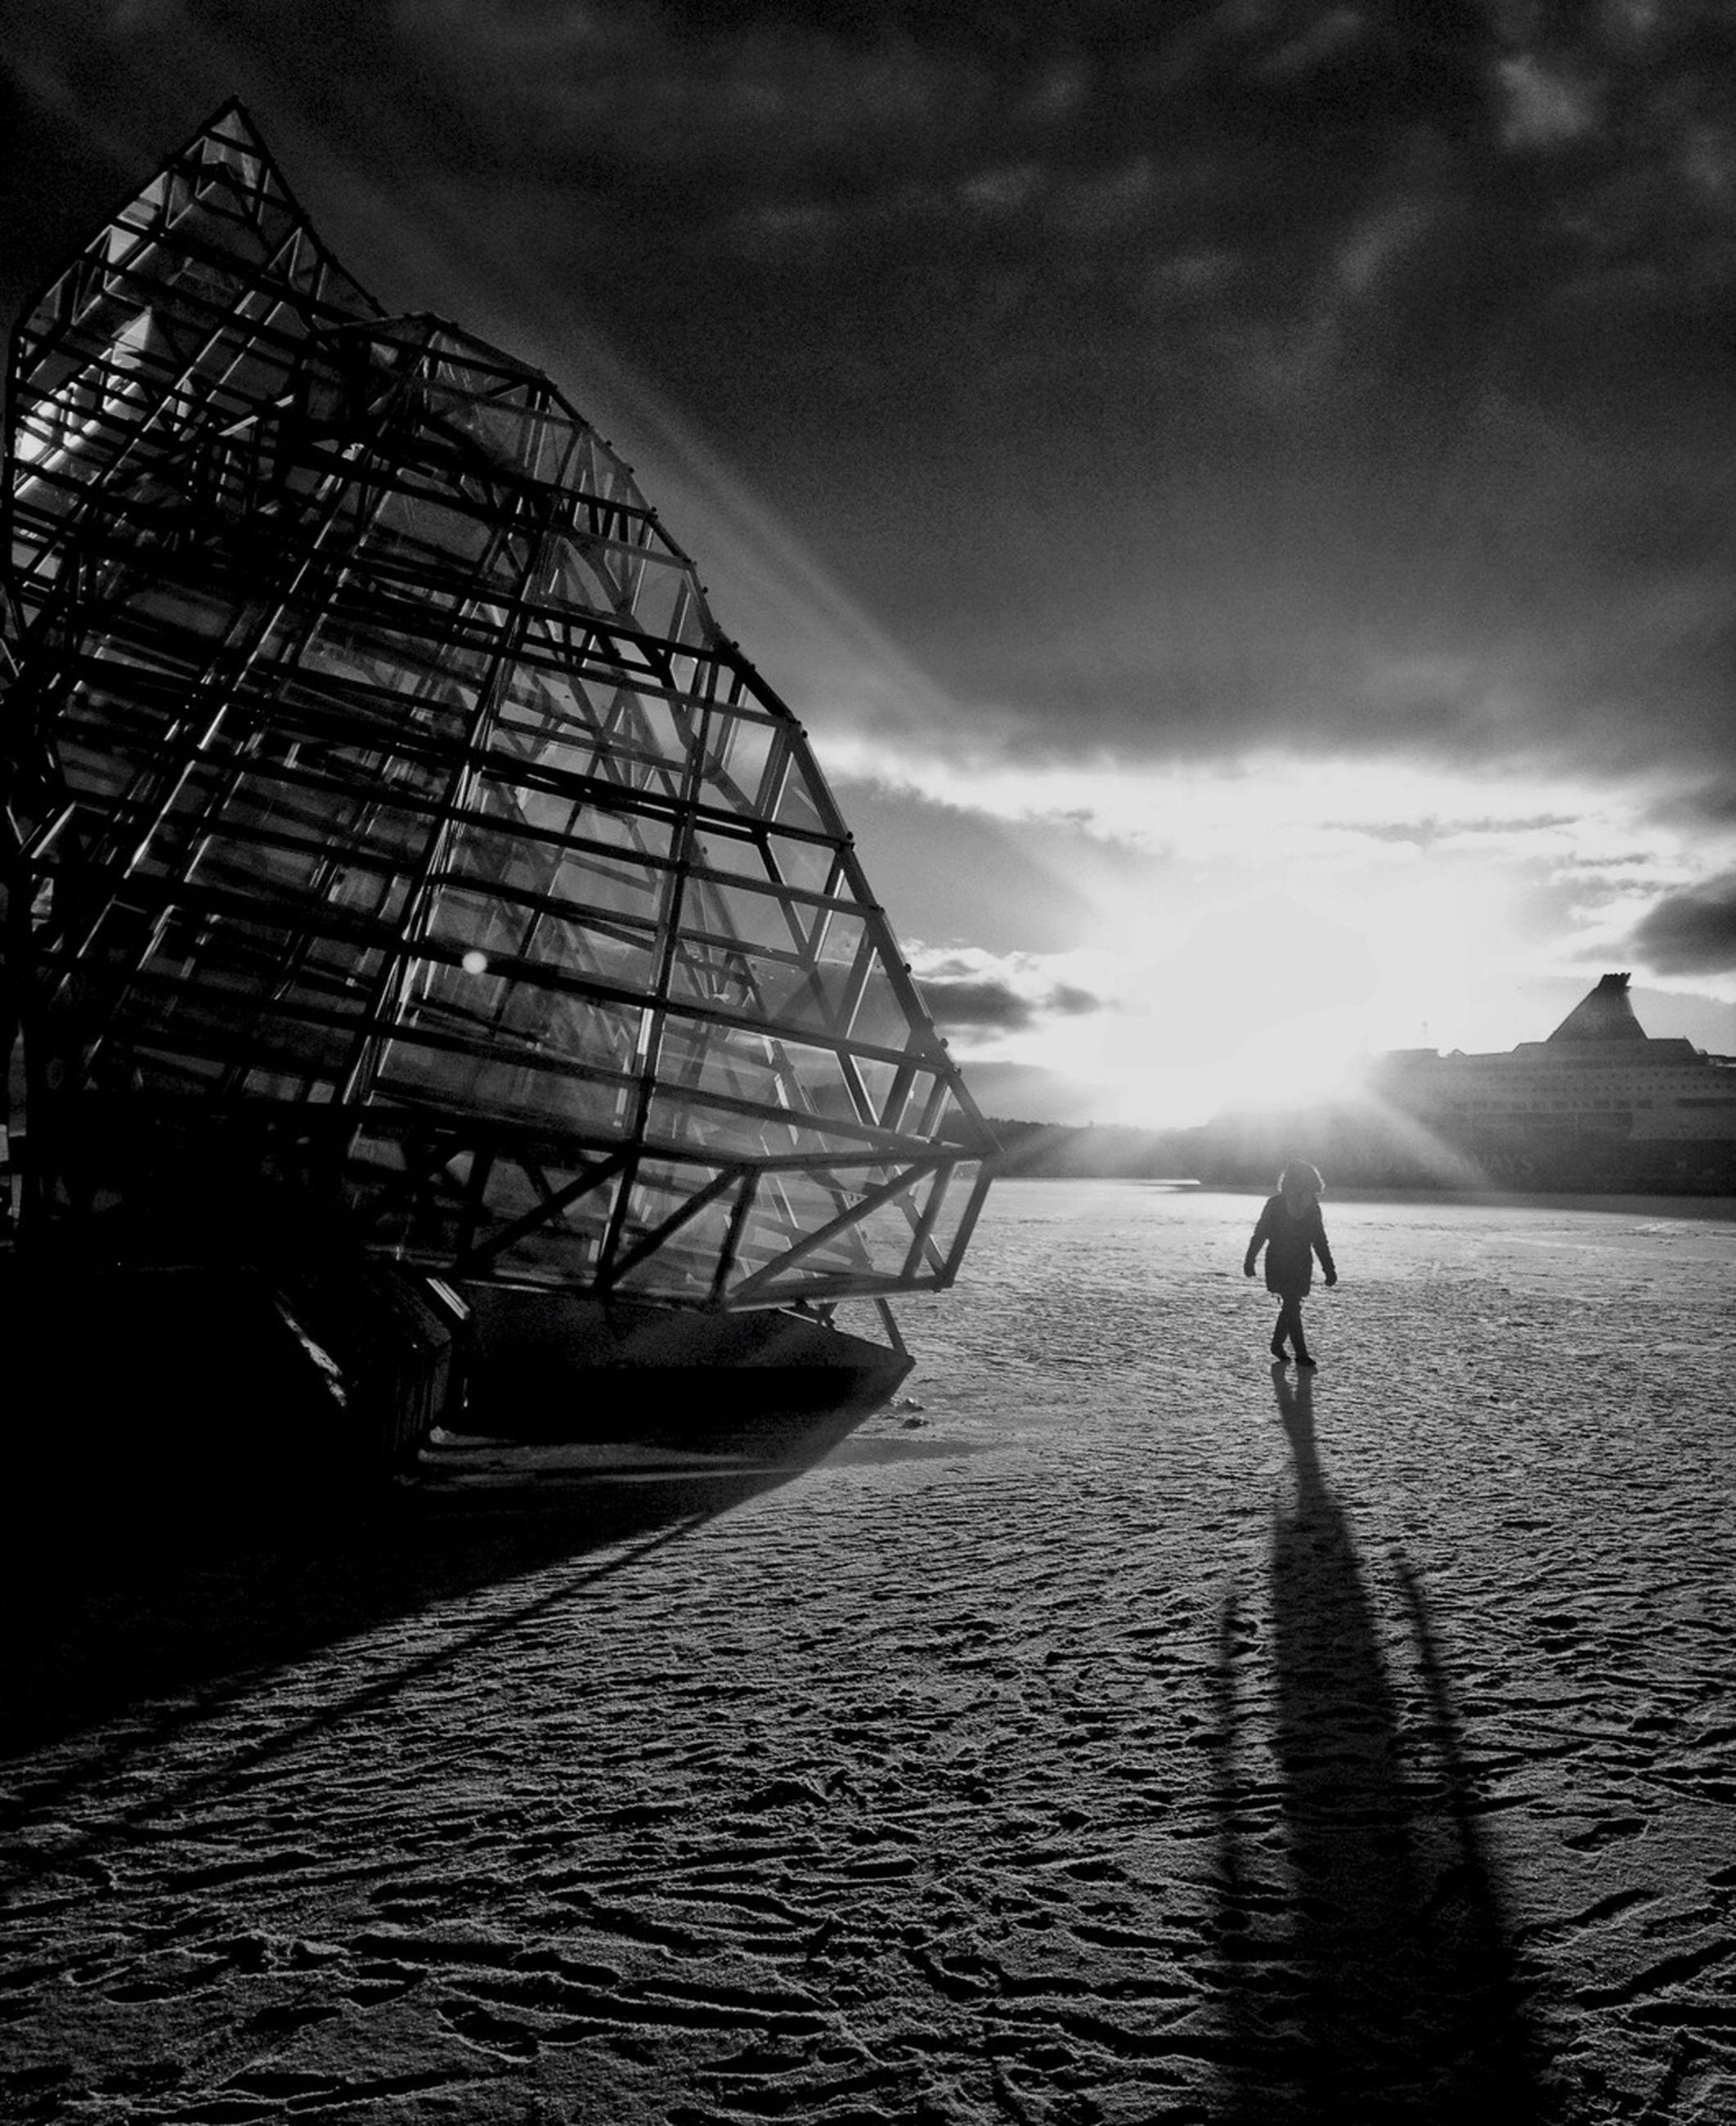 sky, sun, lifestyles, water, leisure activity, cloud - sky, silhouette, sunbeam, full length, sunlight, sea, sunset, men, beach, cloud, walking, lens flare, person